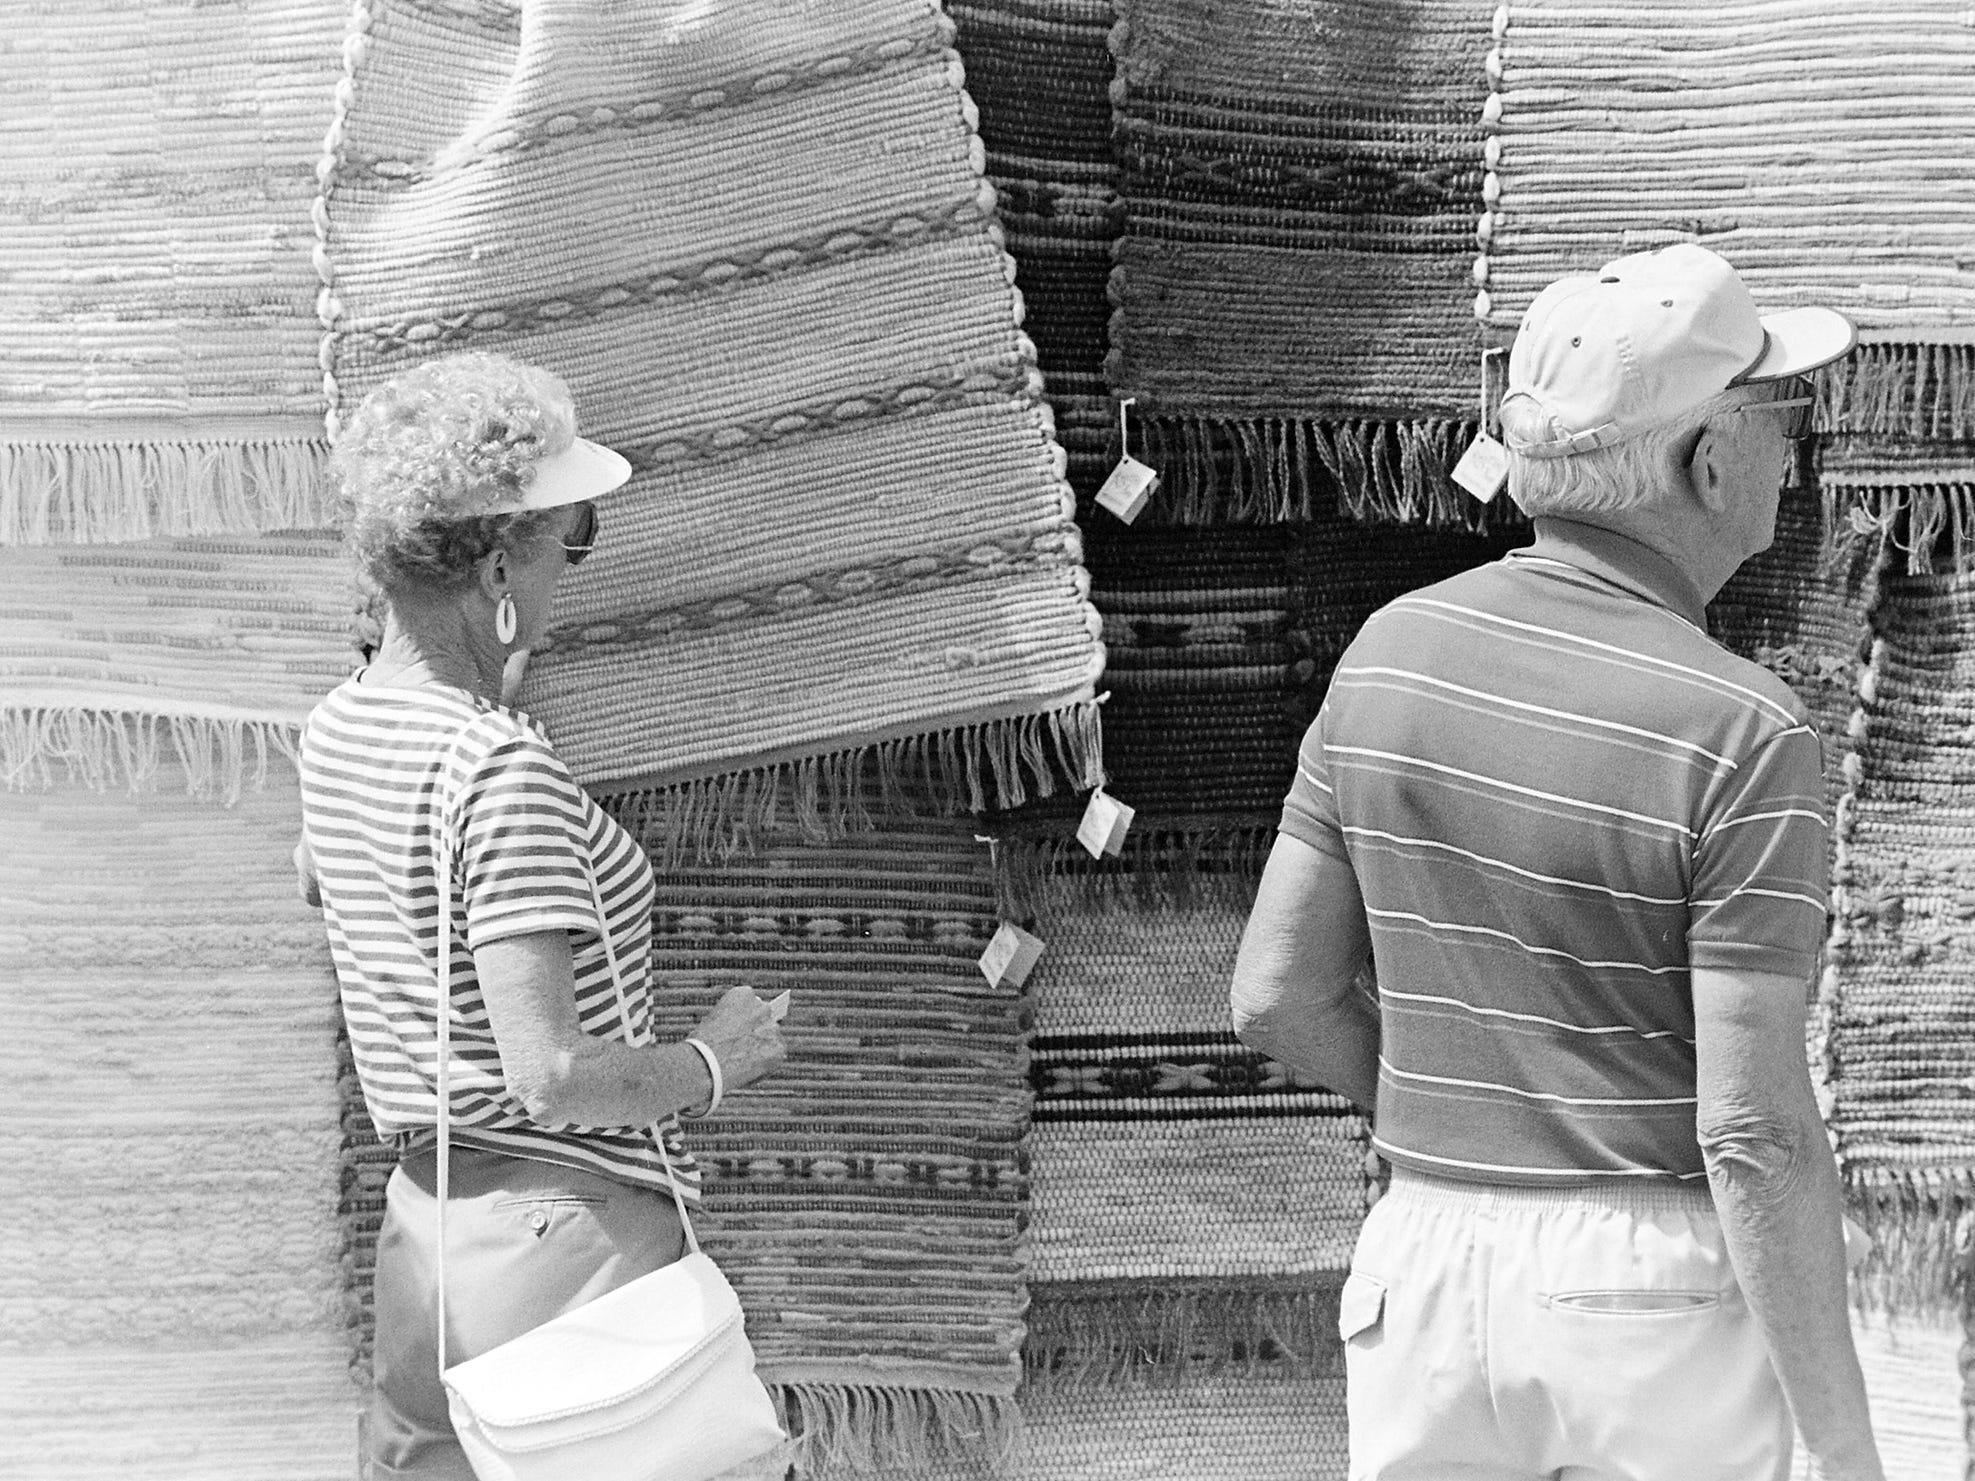 07/18/88Poulsbo Art Fair